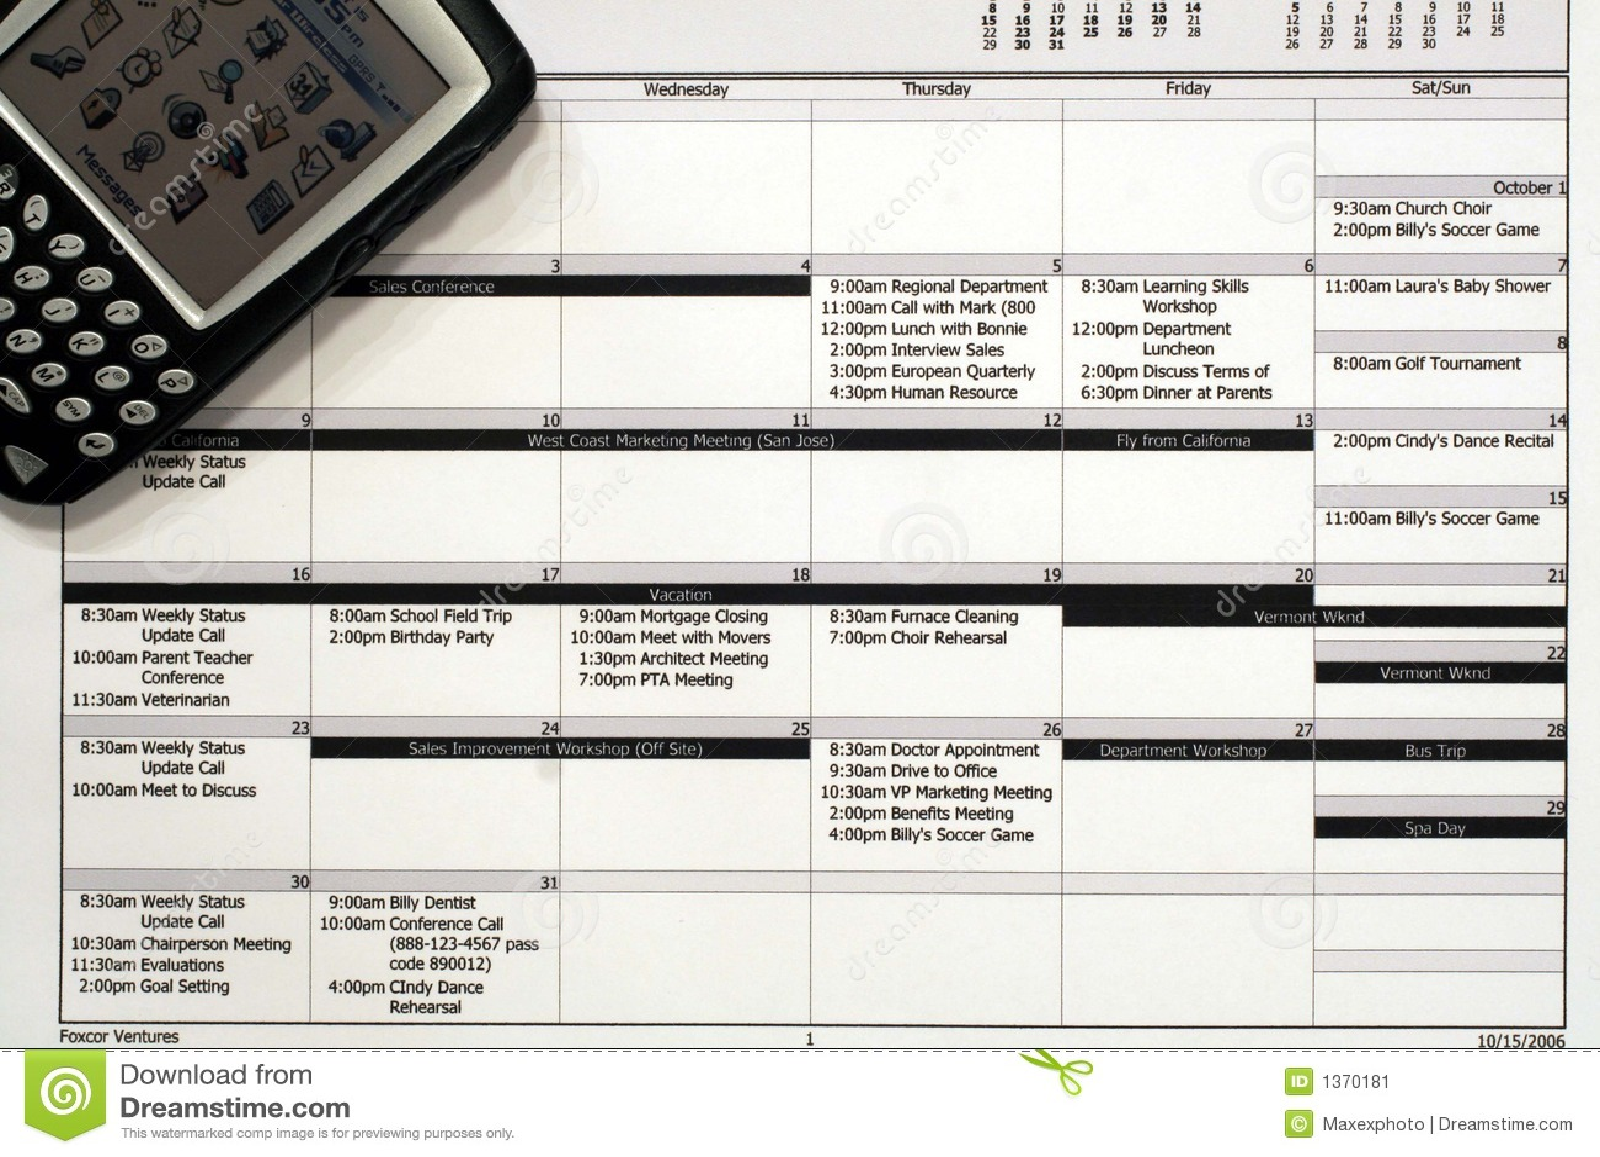 Monthly Work Schedule PDA Image Image 1370181 – Work Schedule